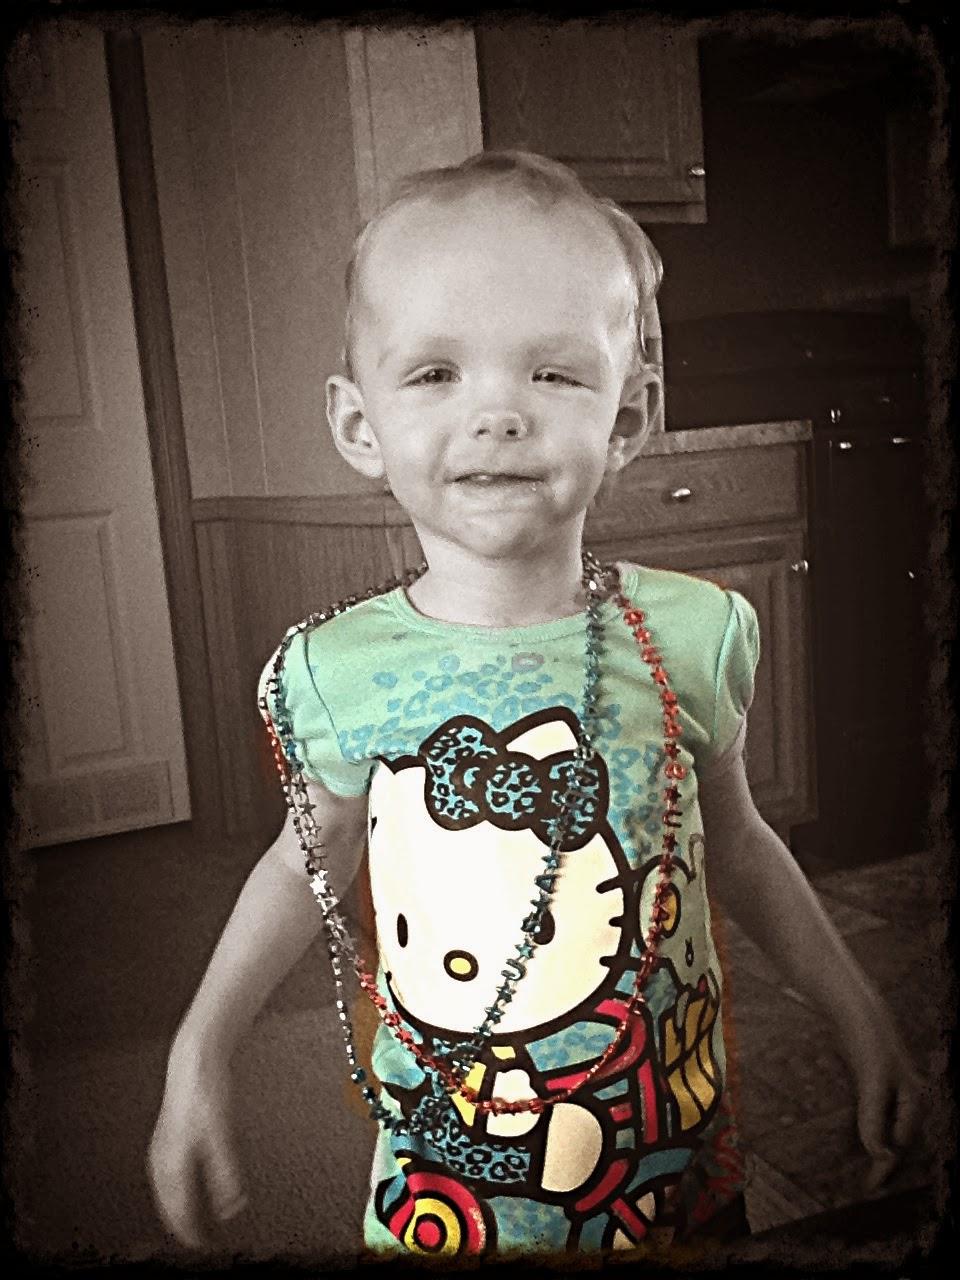 Фото детей с синдромом сотоса